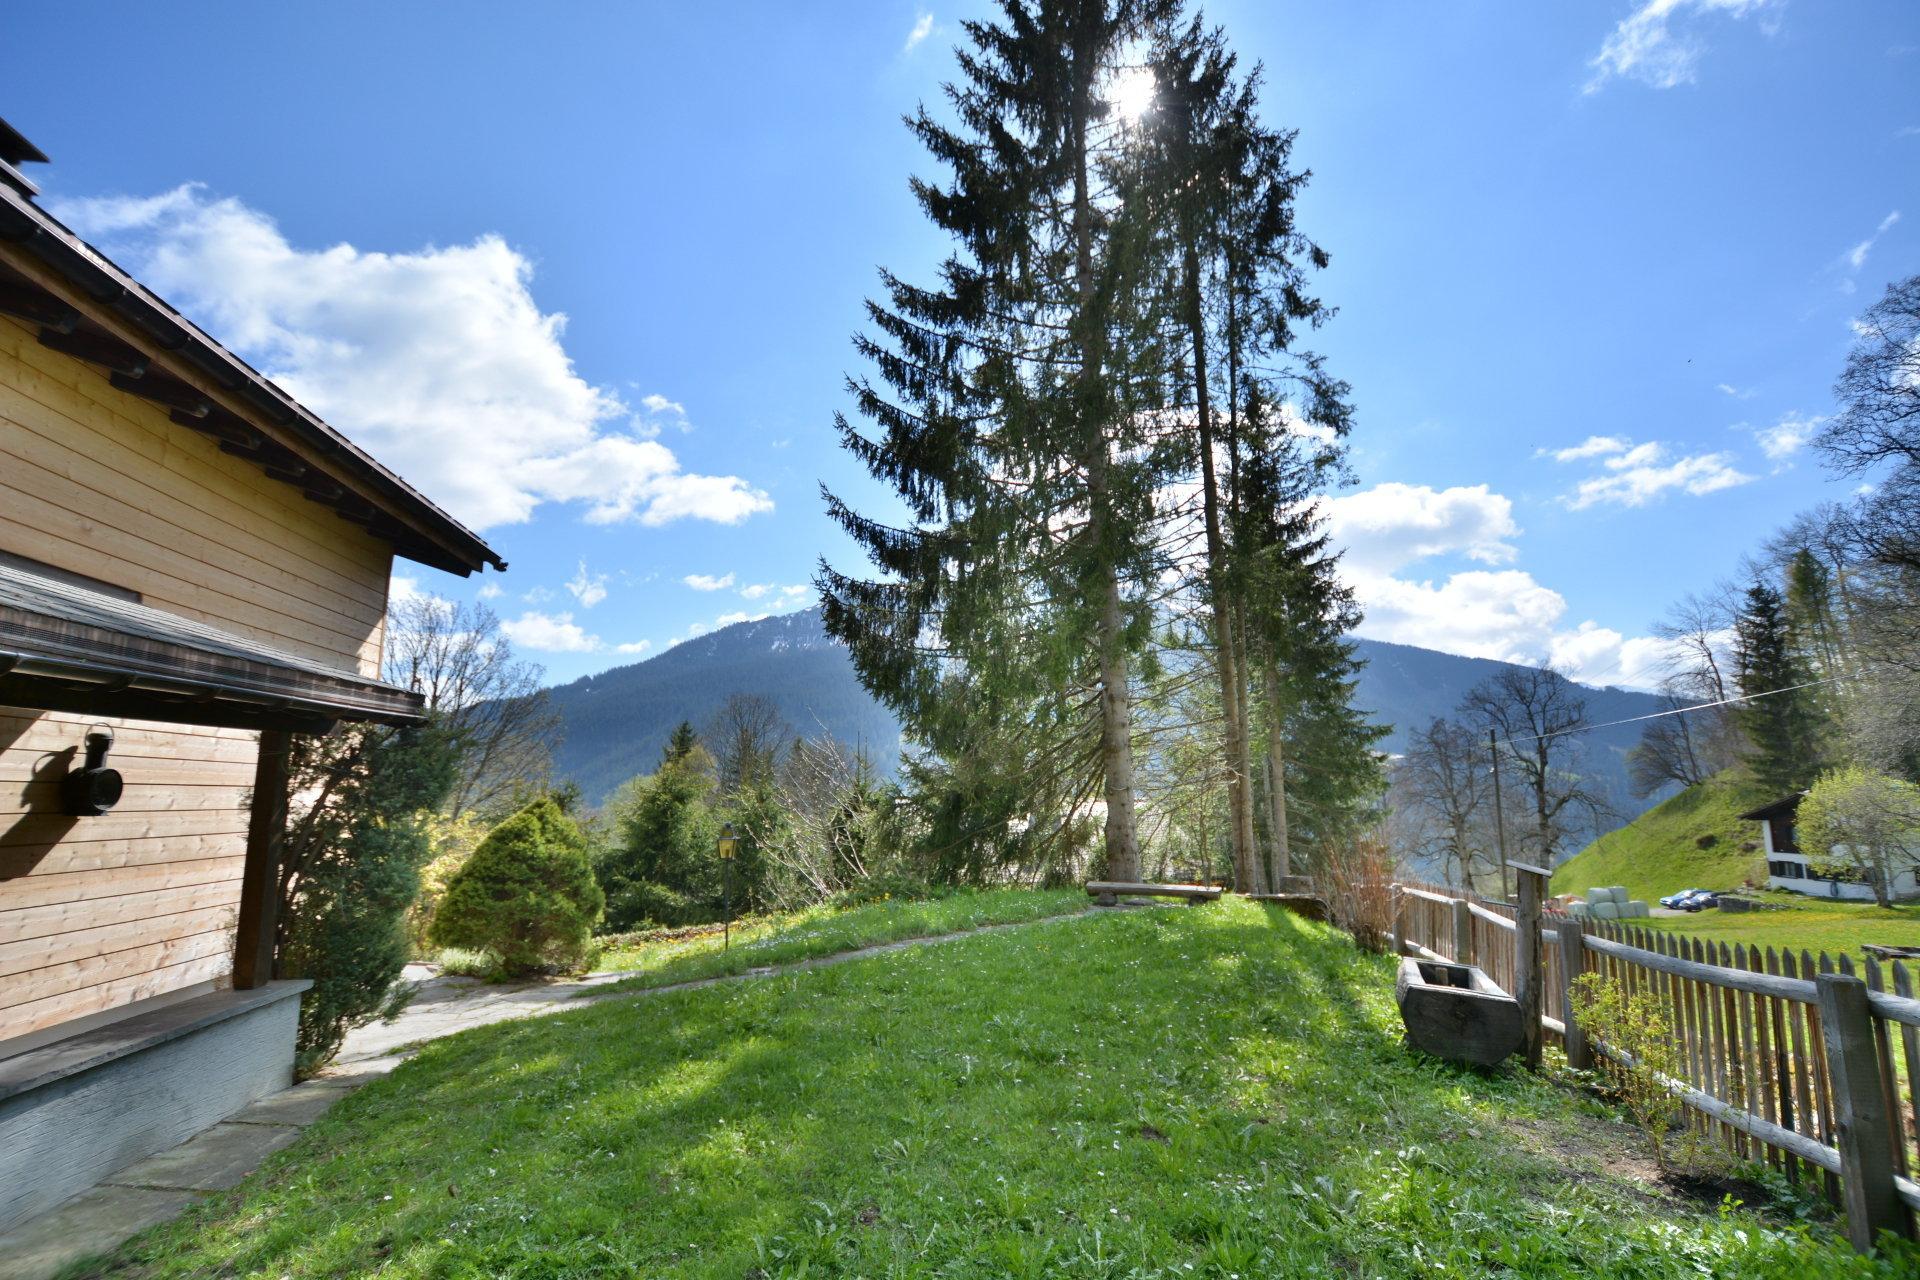 Chalet-Fuechsli-Klosters-Sommer-12.JPG